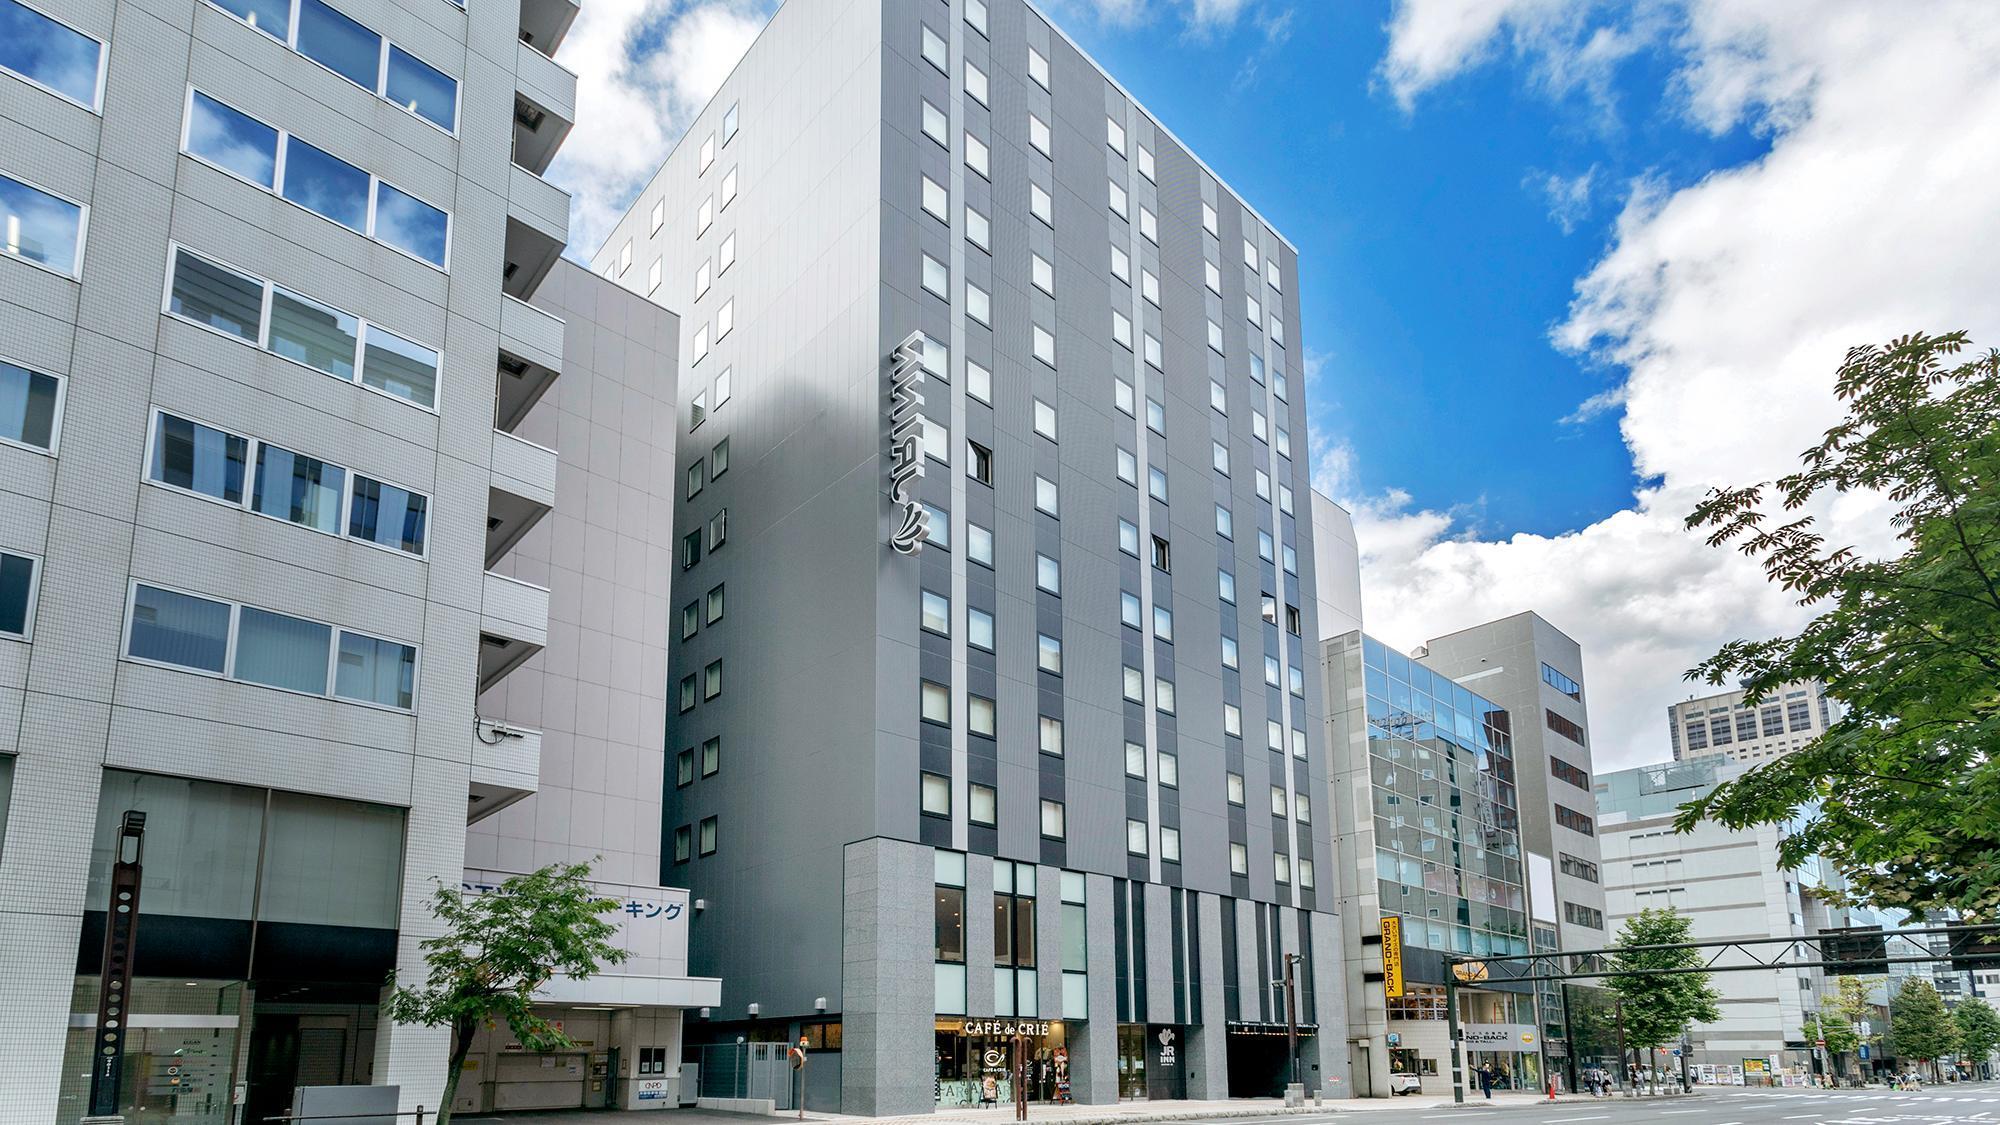 Jr Inn Sapporo Kita 2 Sapporo Offers Free Cancellation 2021 Price Lists Reviews